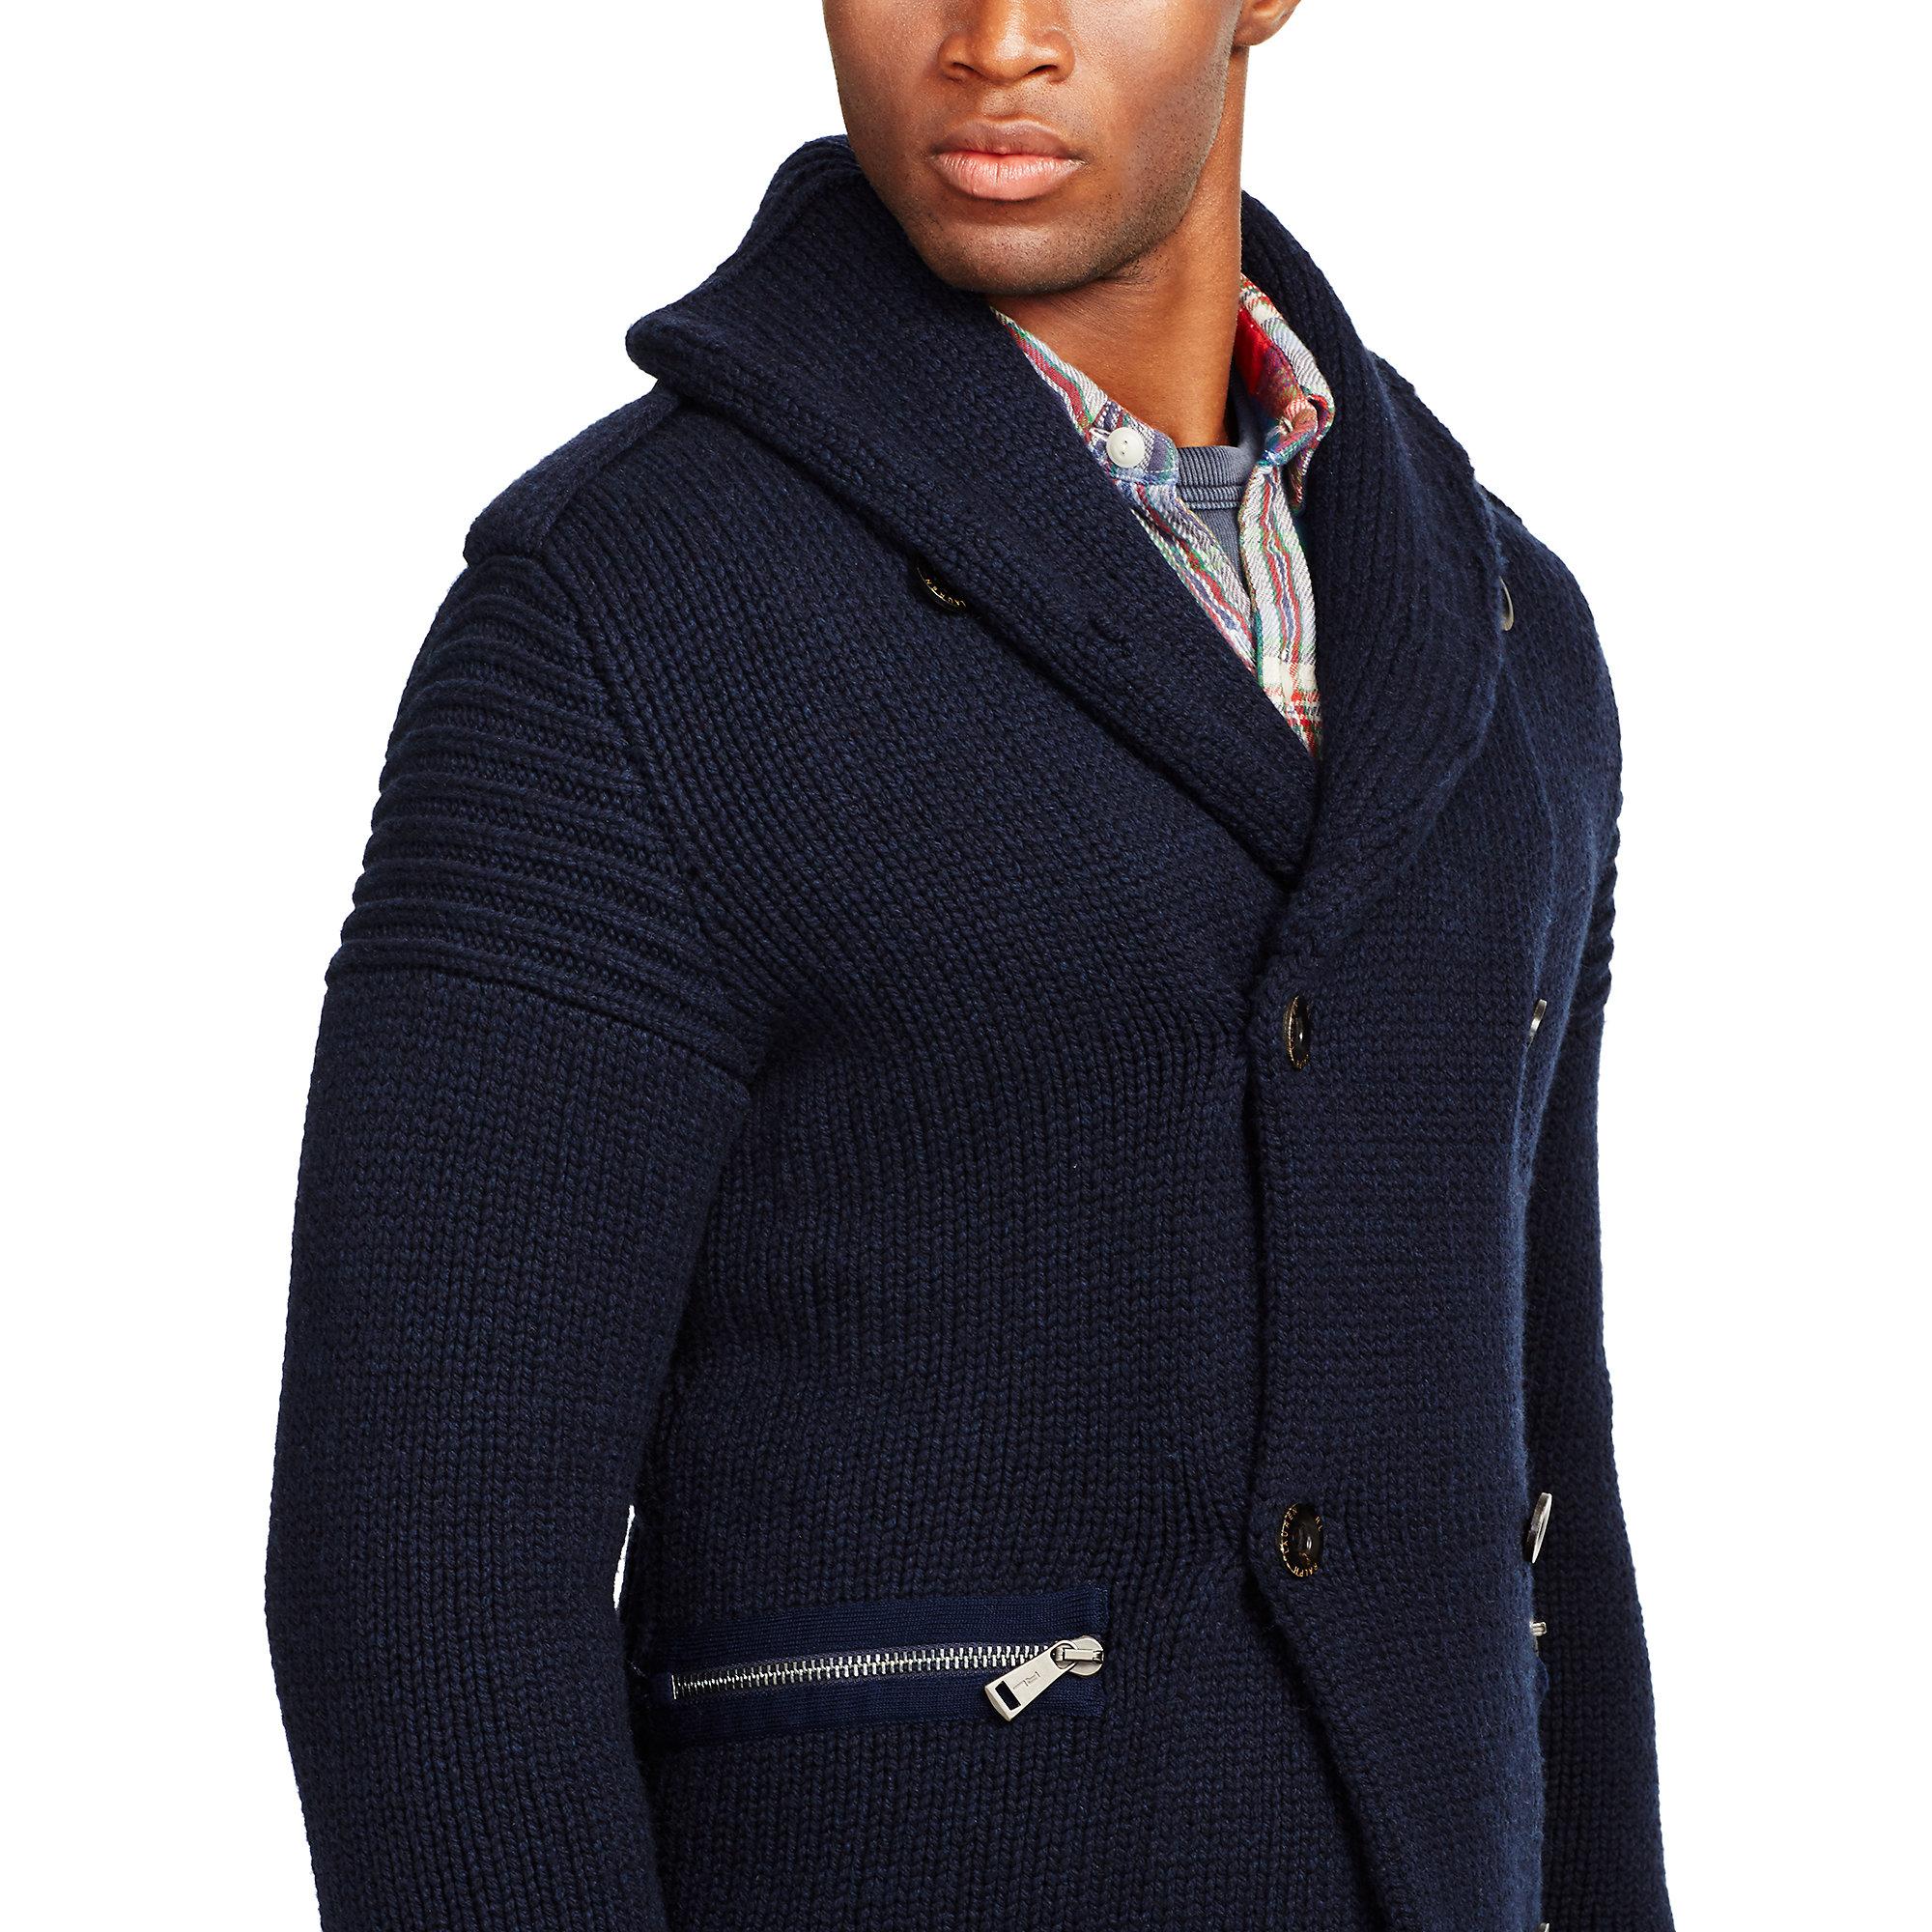 9f6c6e07a0 Polo Ralph Lauren Blue Merino Wool Shawl Cardigan for men